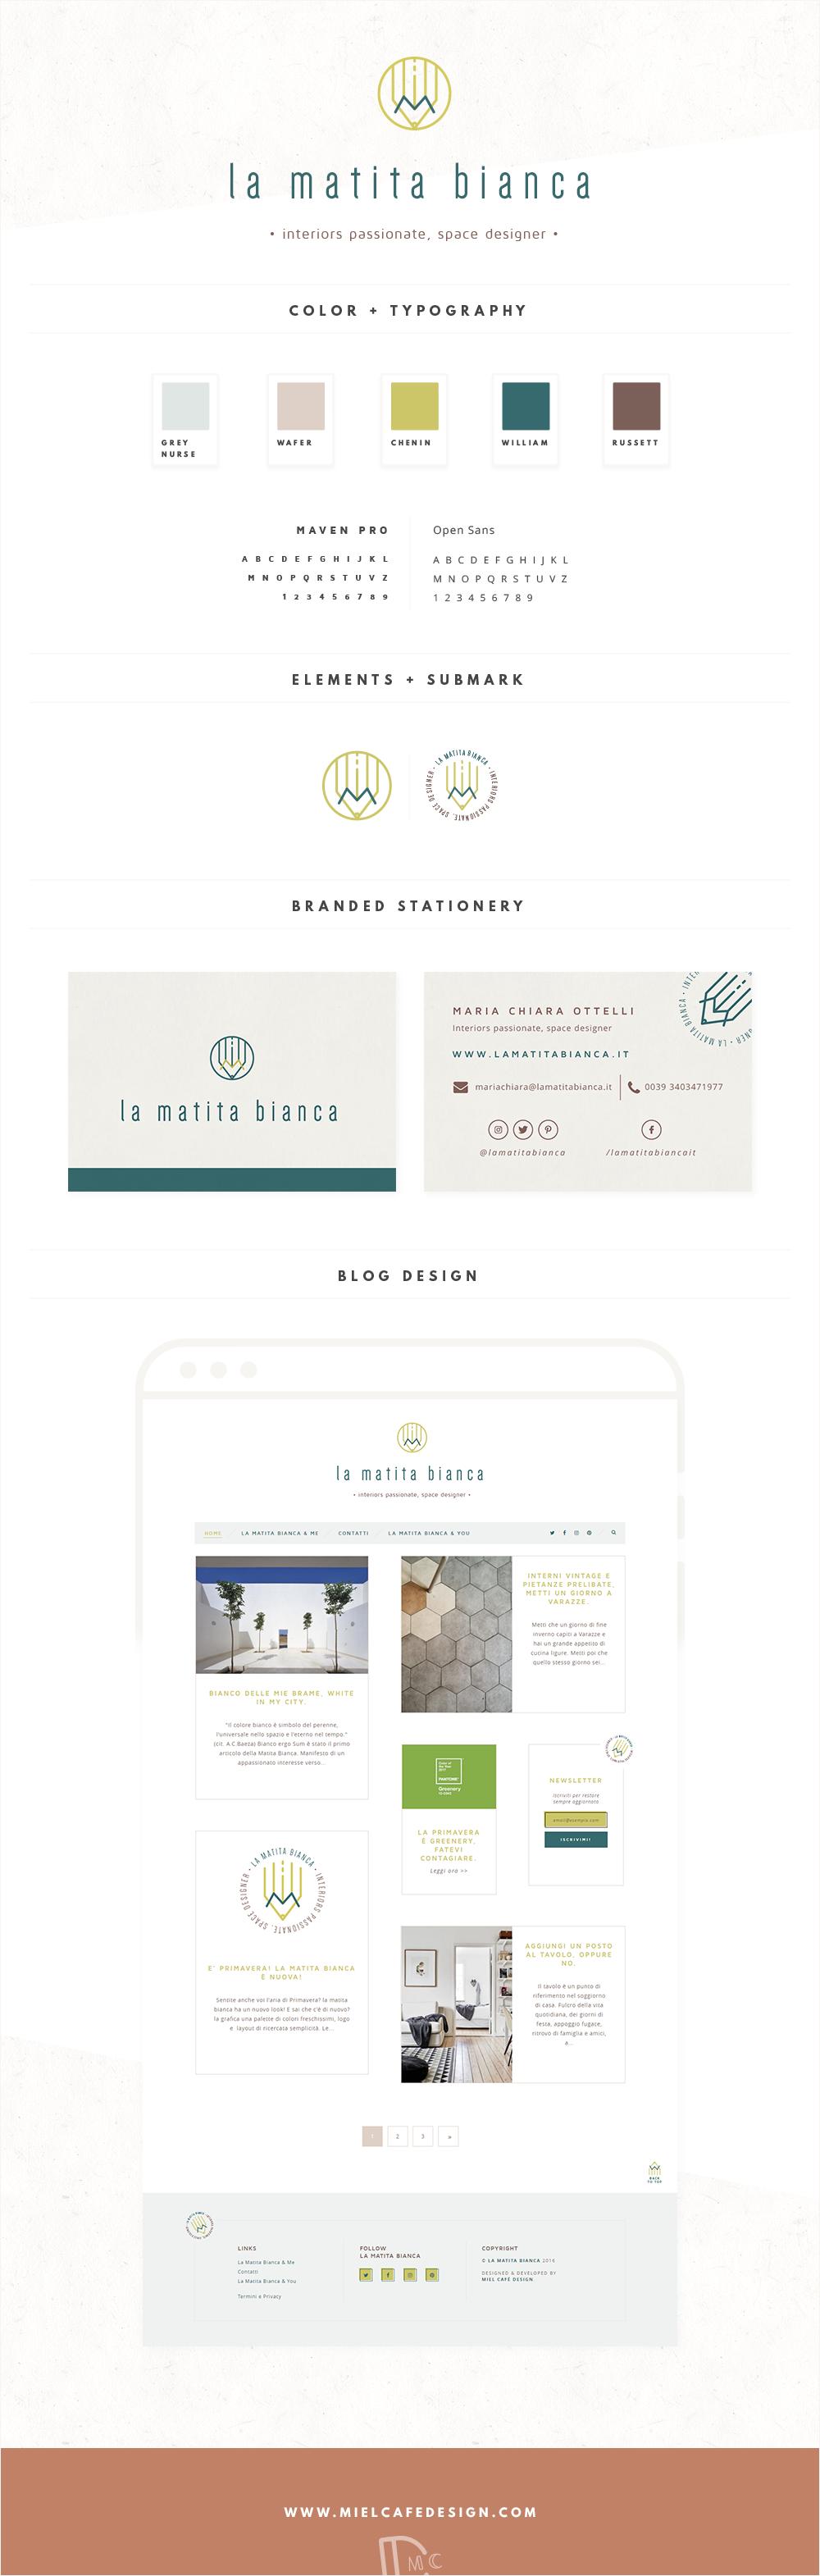 La Matita Bianca Custom Blog Design + Branded Stationery